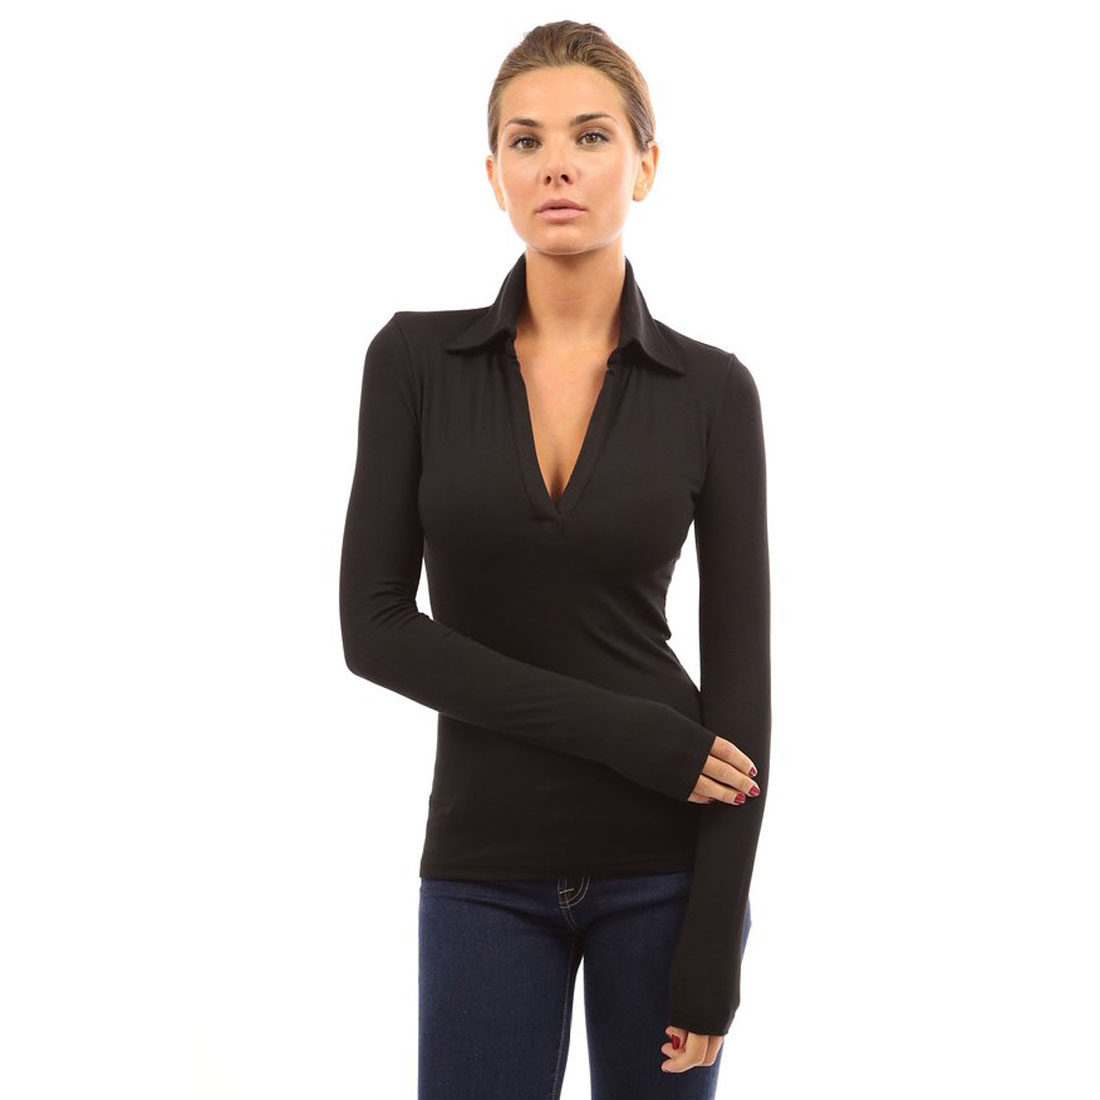 Polo Blouse V Neck Womens Long Short Sleeve Shirts Tops ...